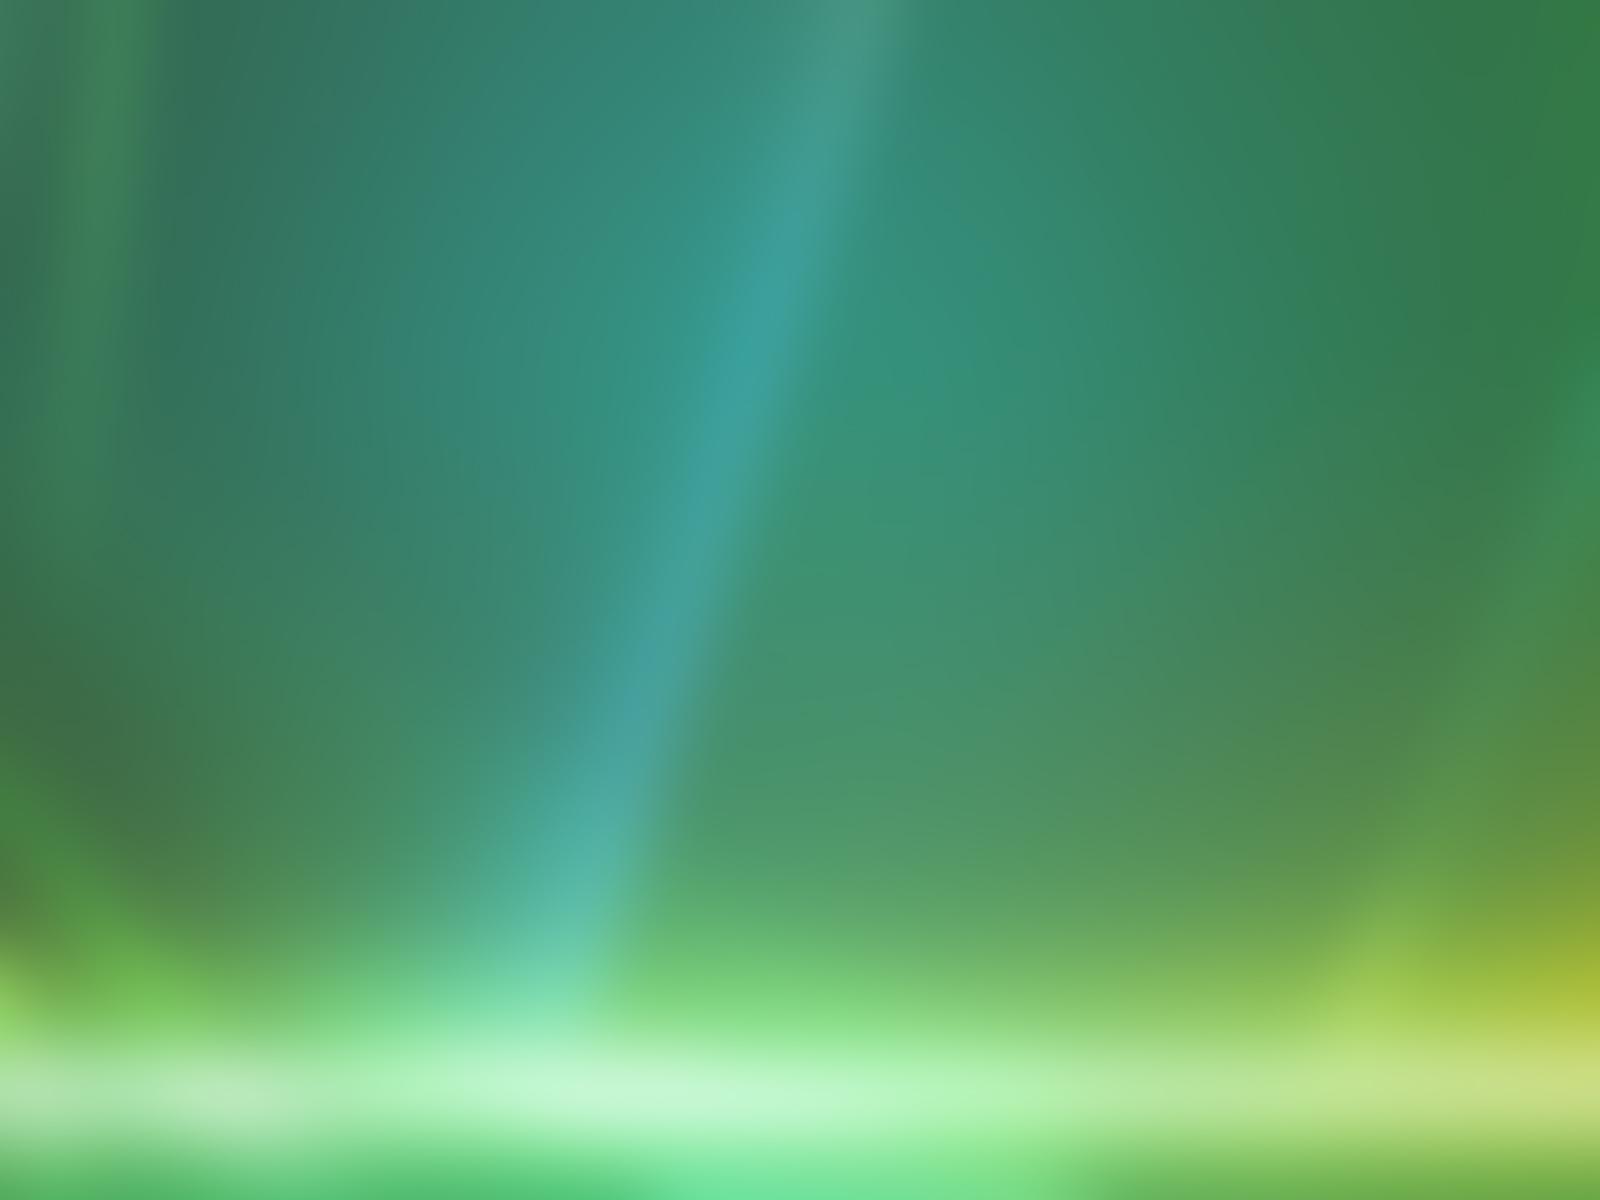 Smiley Full Hd Wallpaper And Achtergrond: Groene Achtergronden